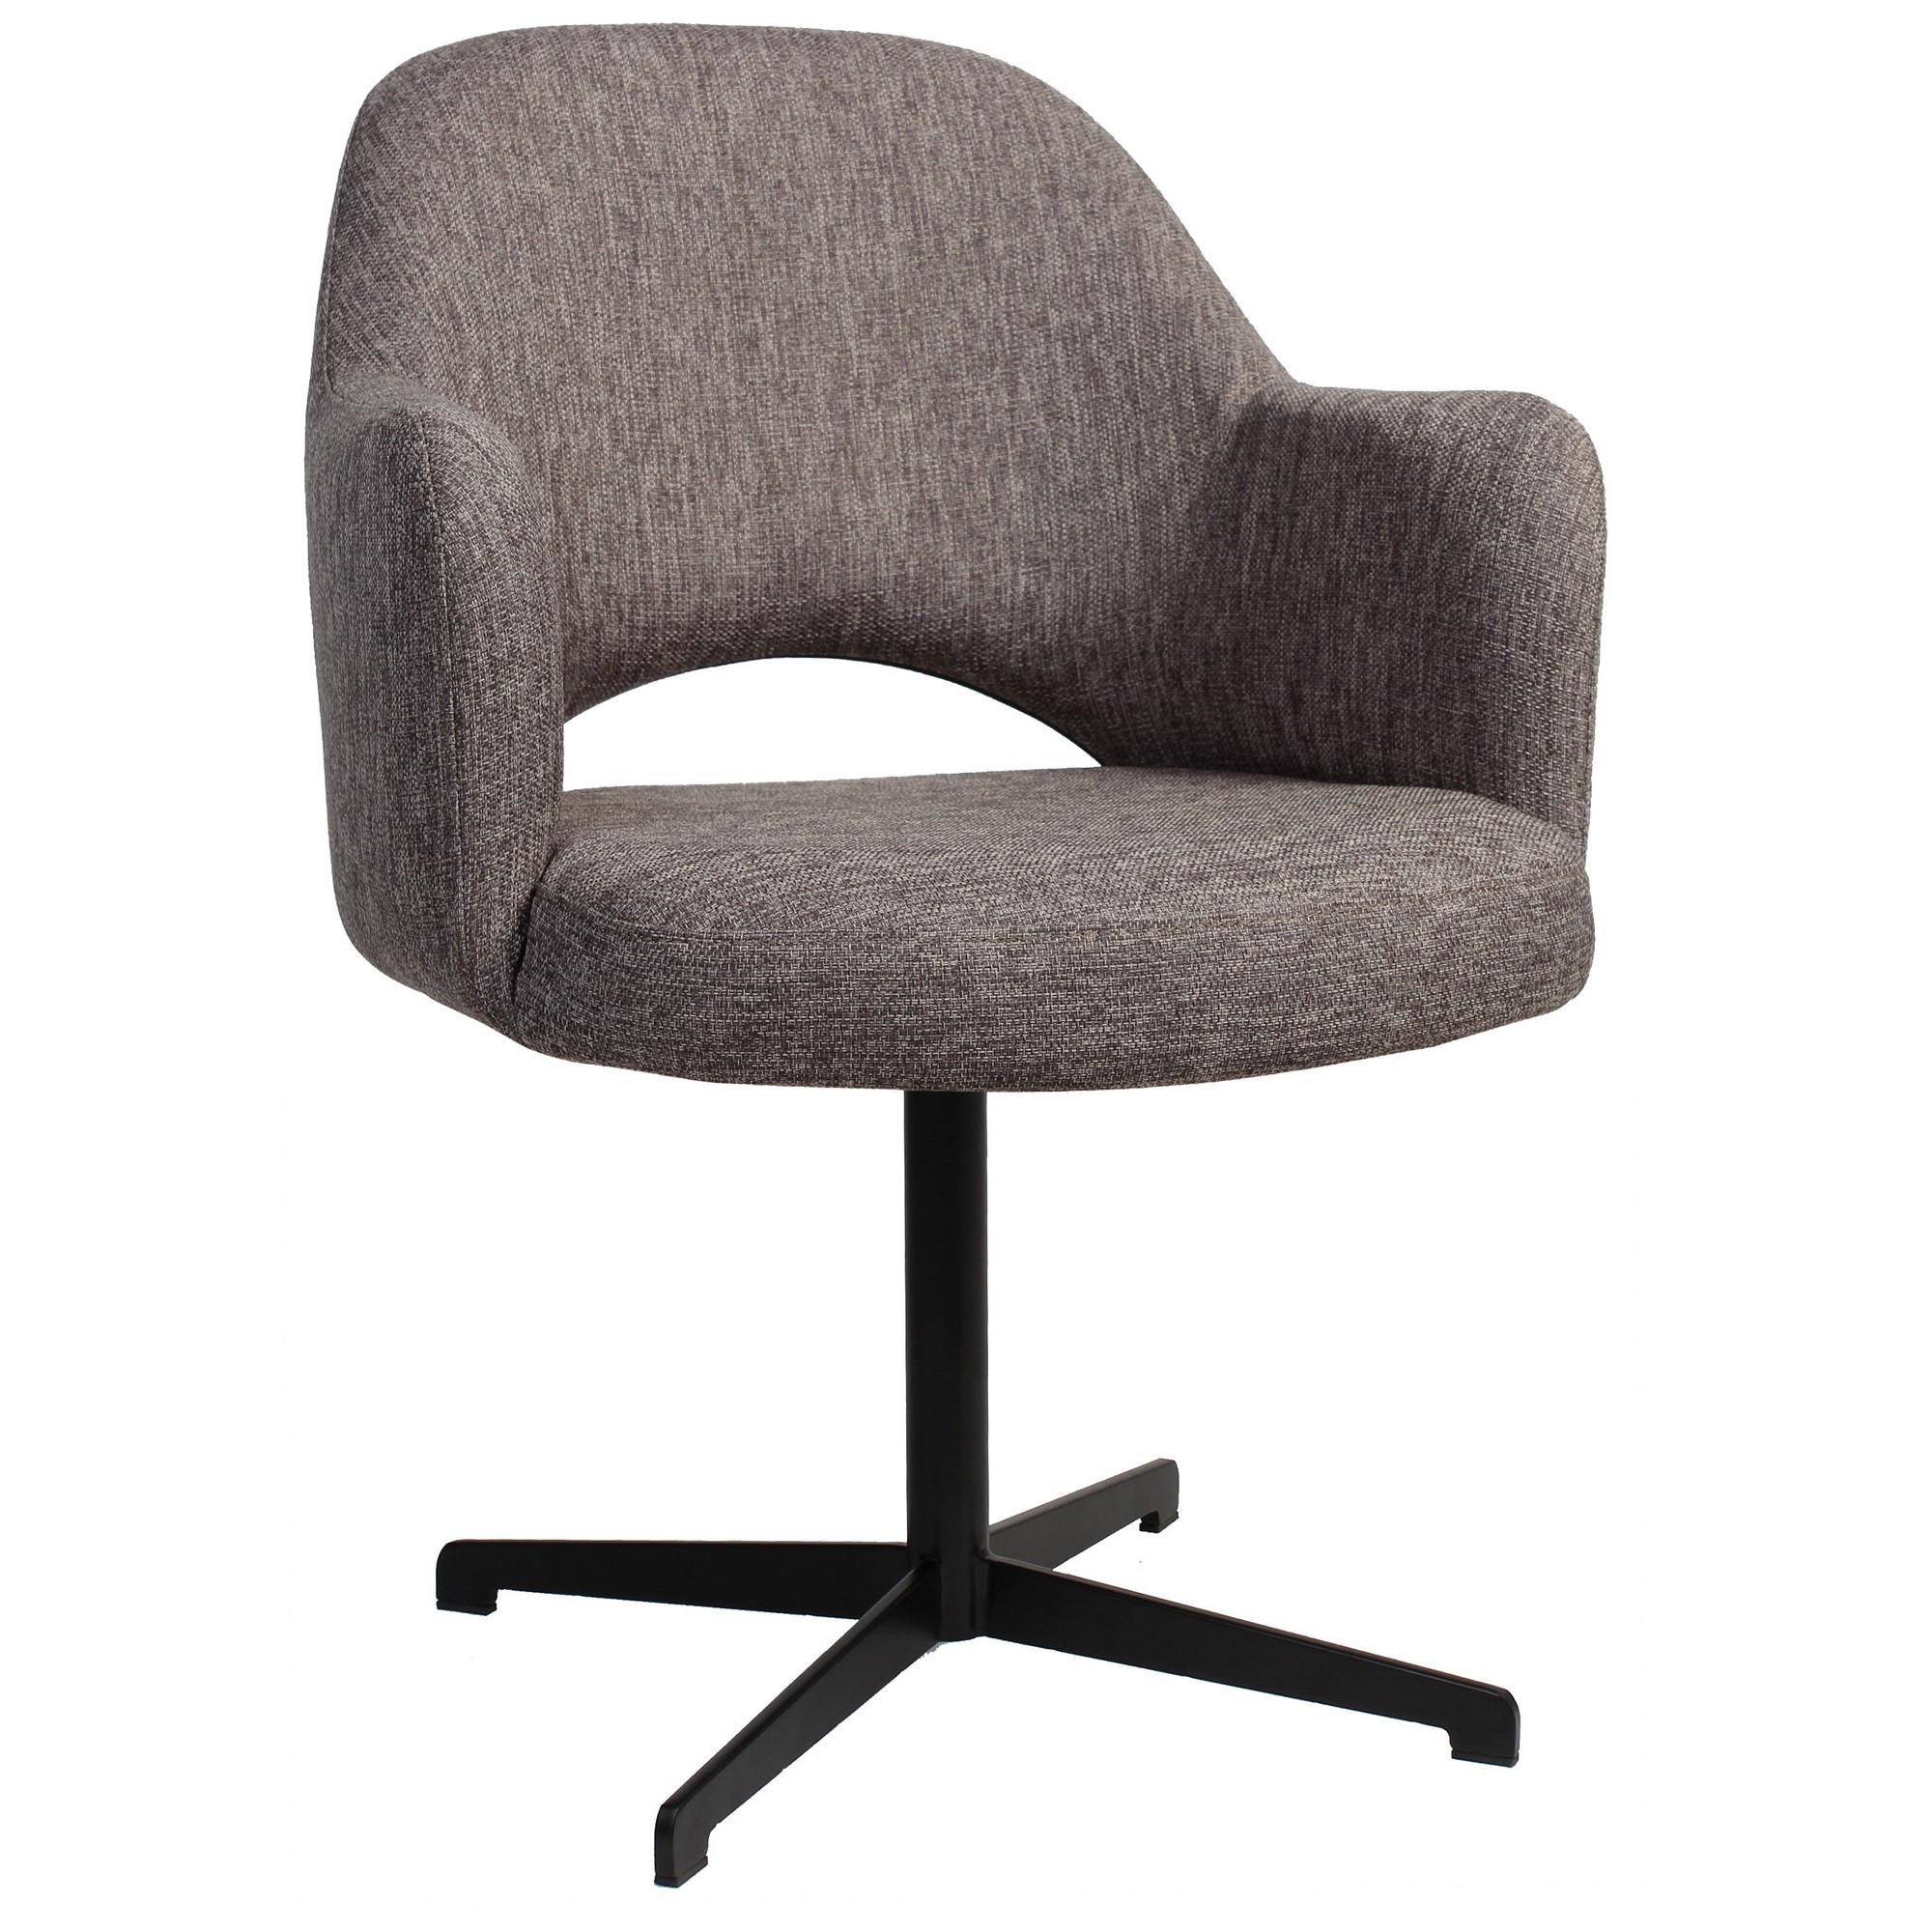 Albury Commercial Grade Fabric Dining Armchair, Metal Blade Leg, Ash Grey / Black